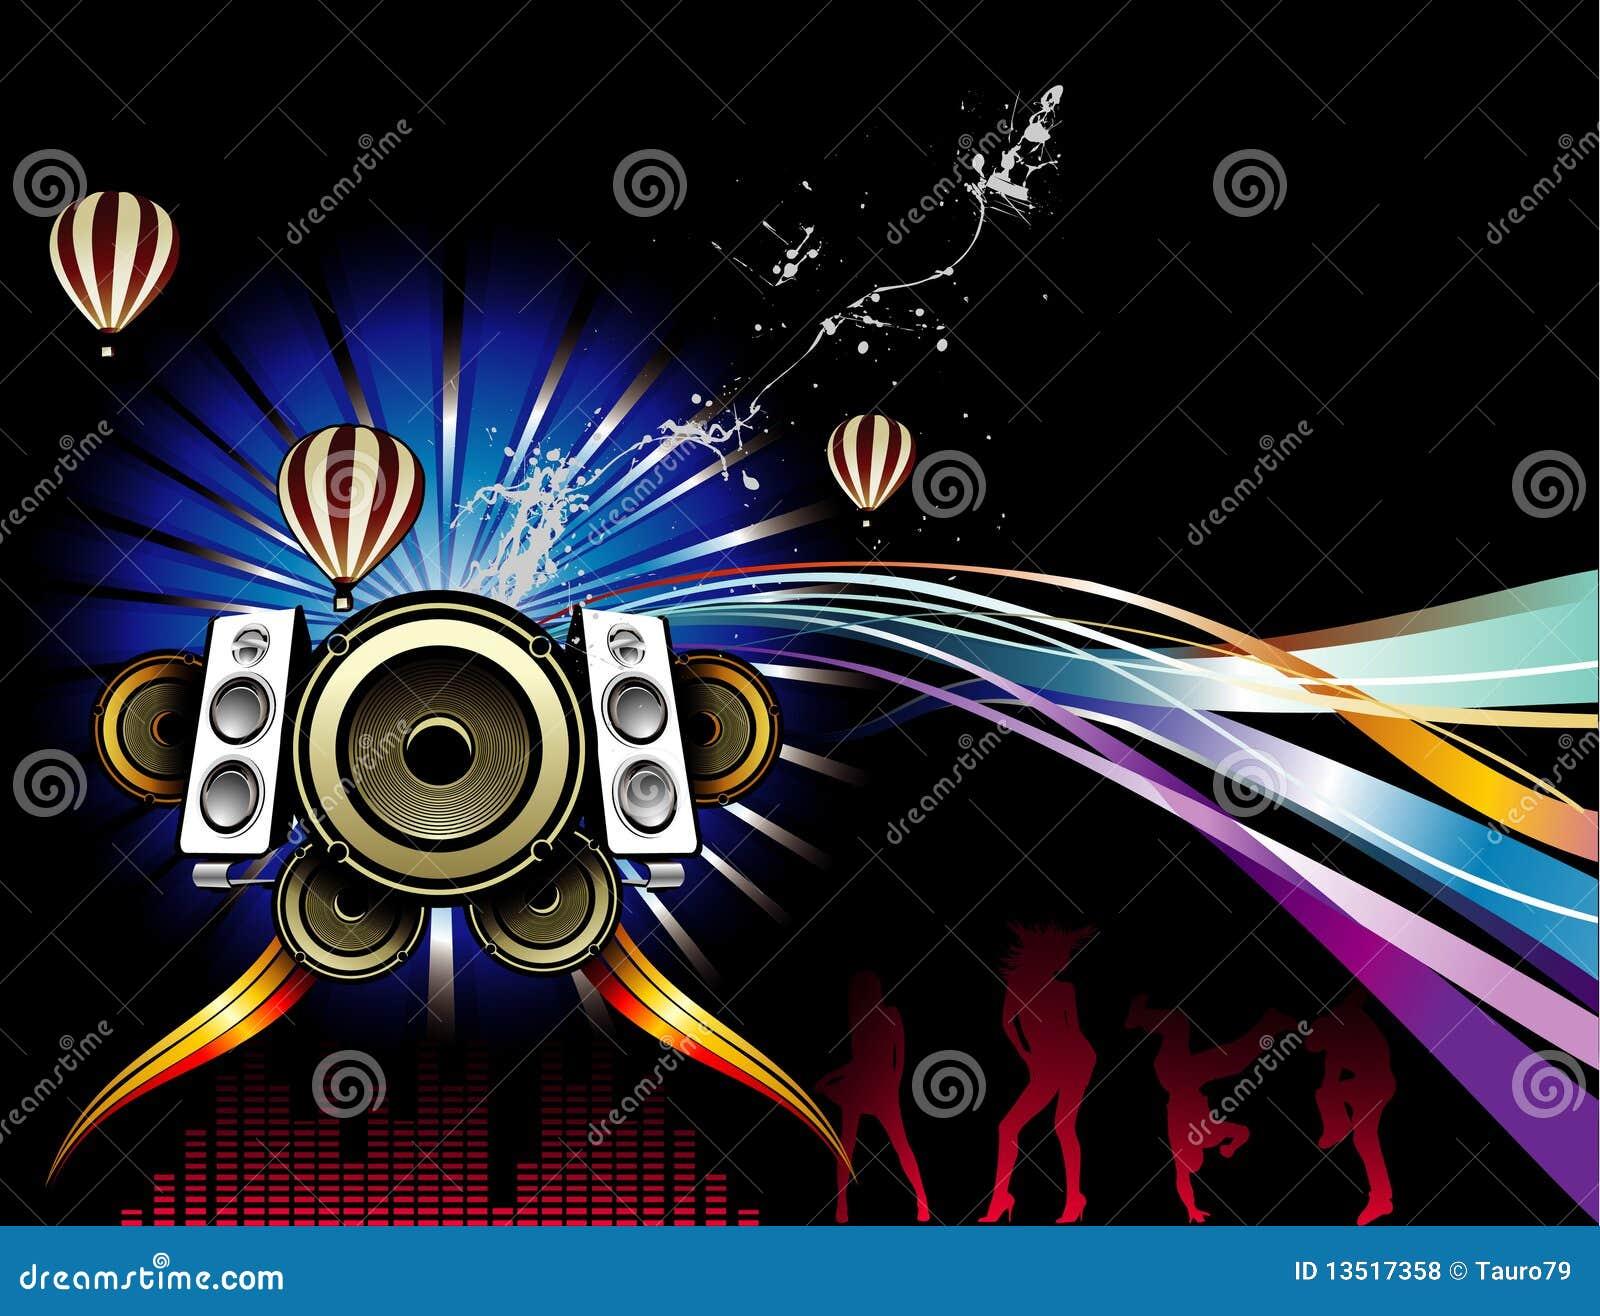 Background party illustration